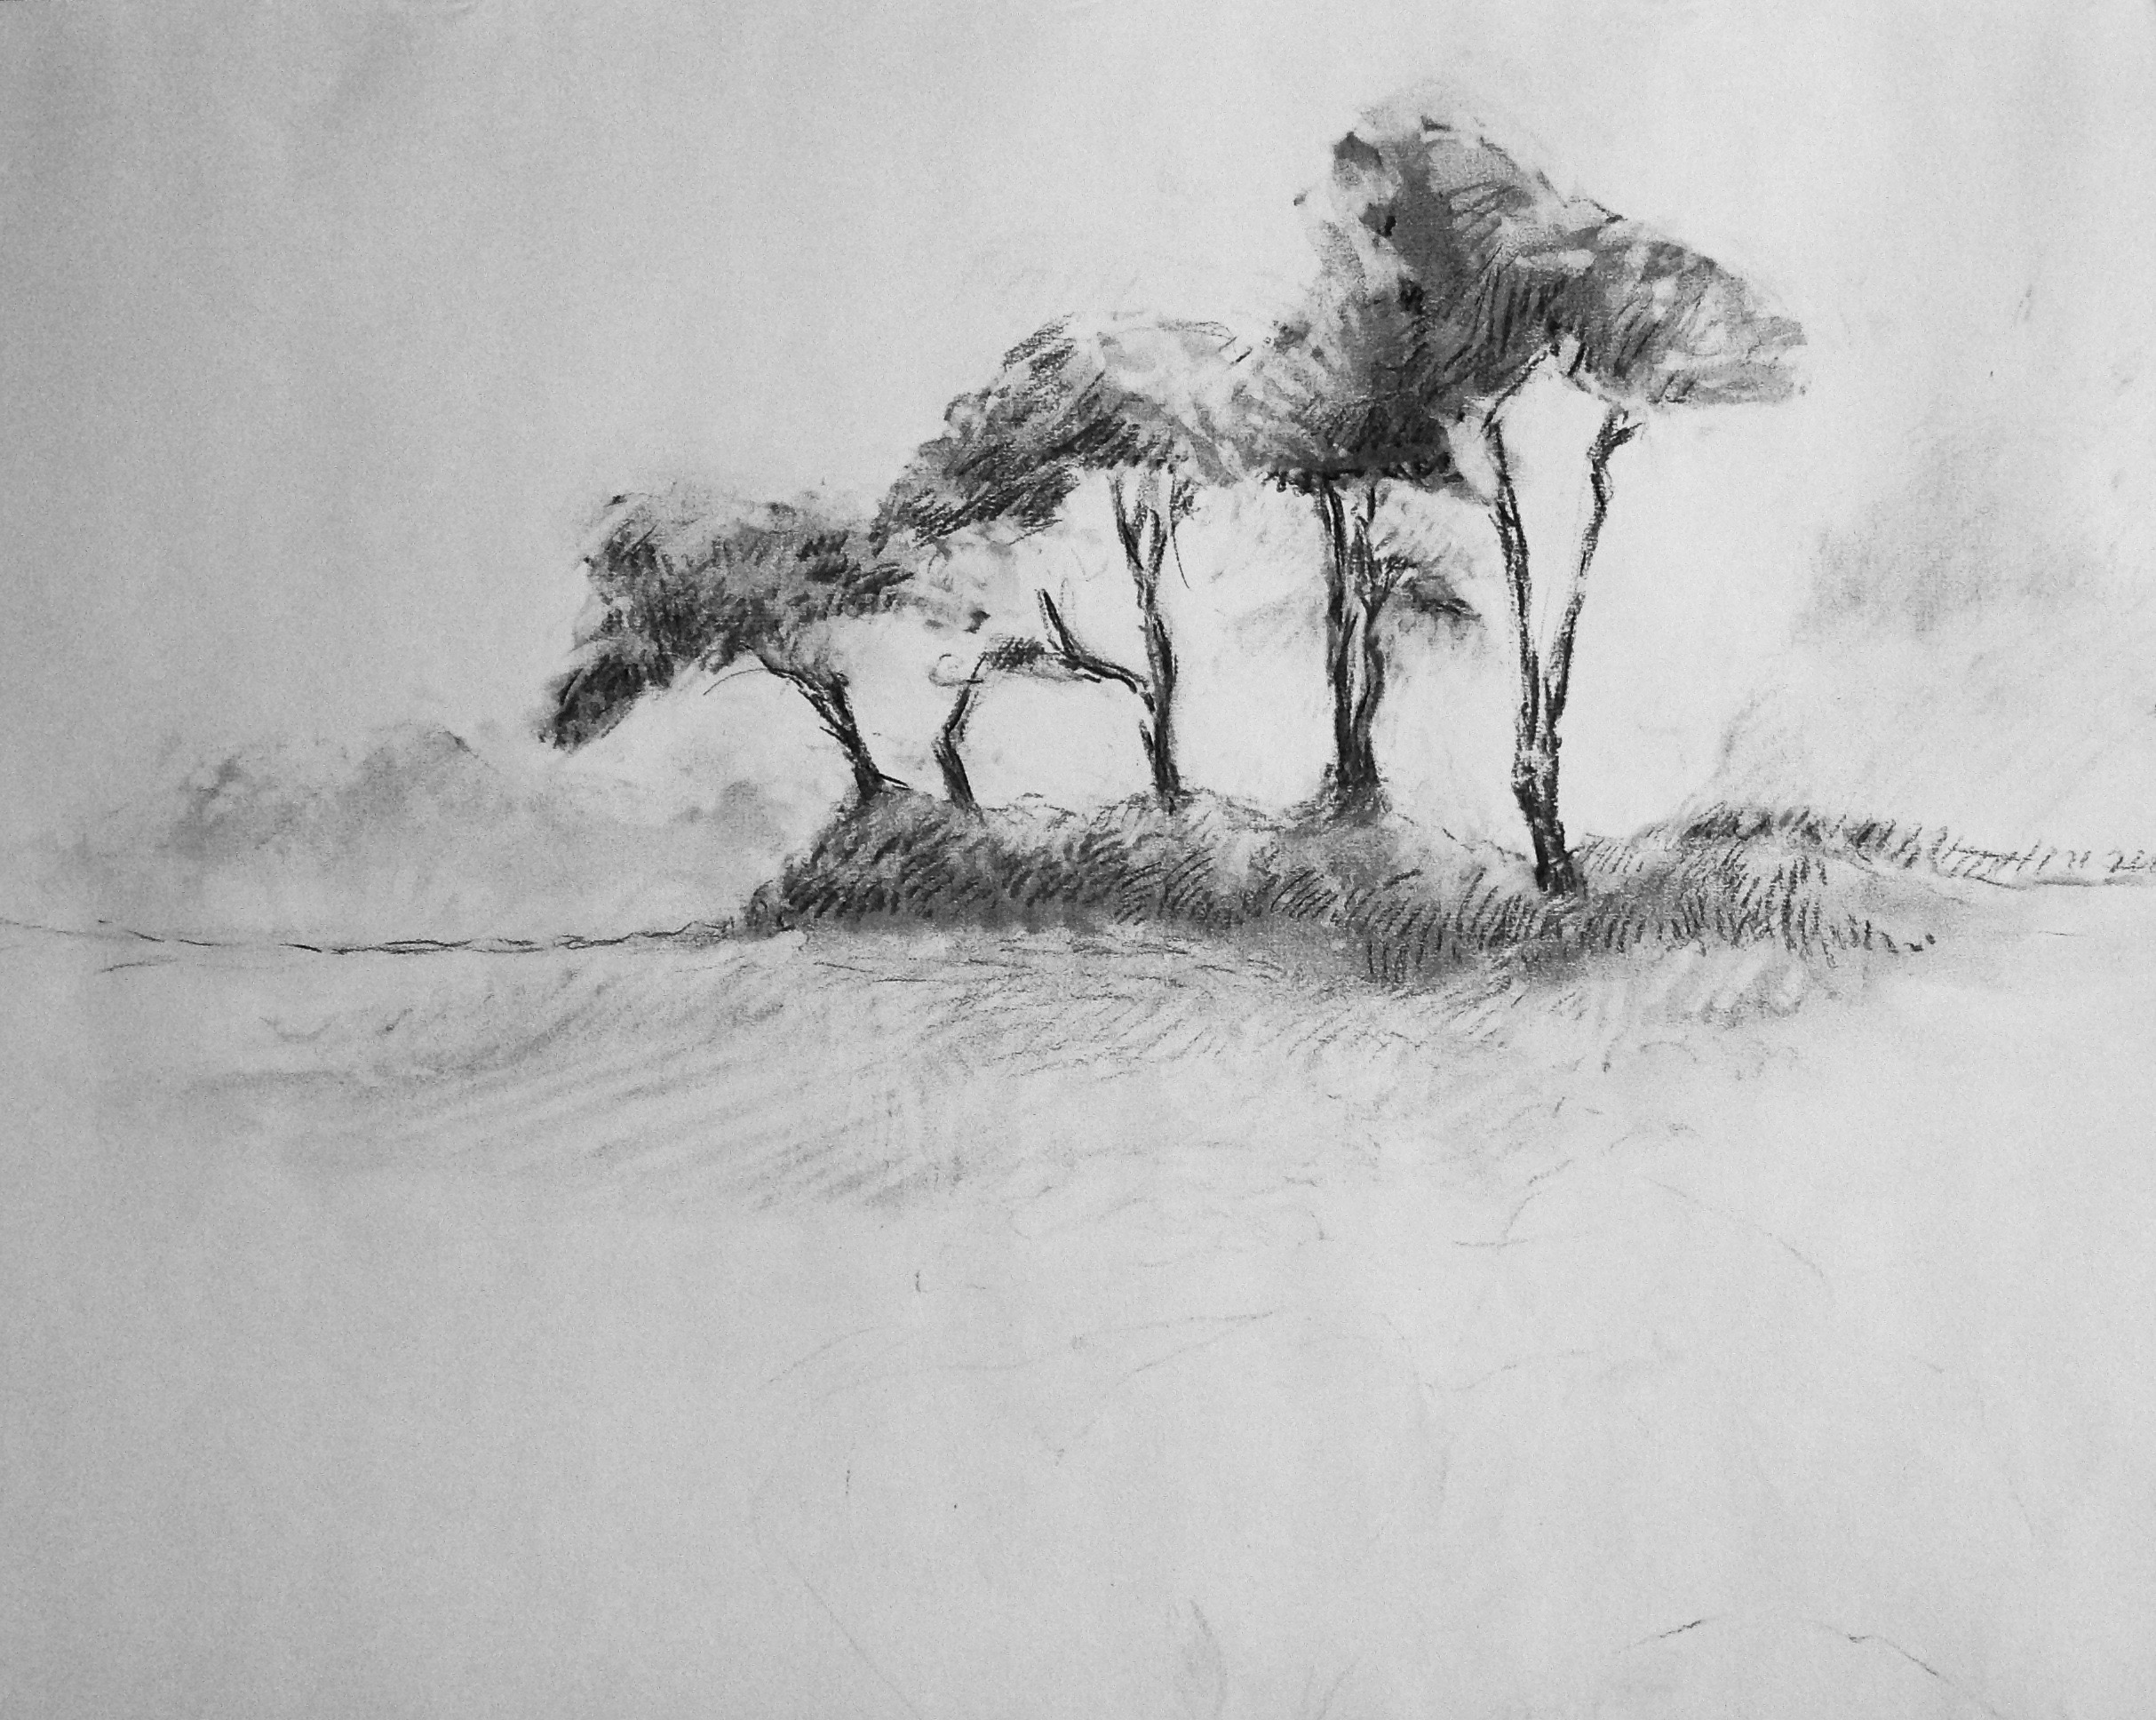 Les pins breton….